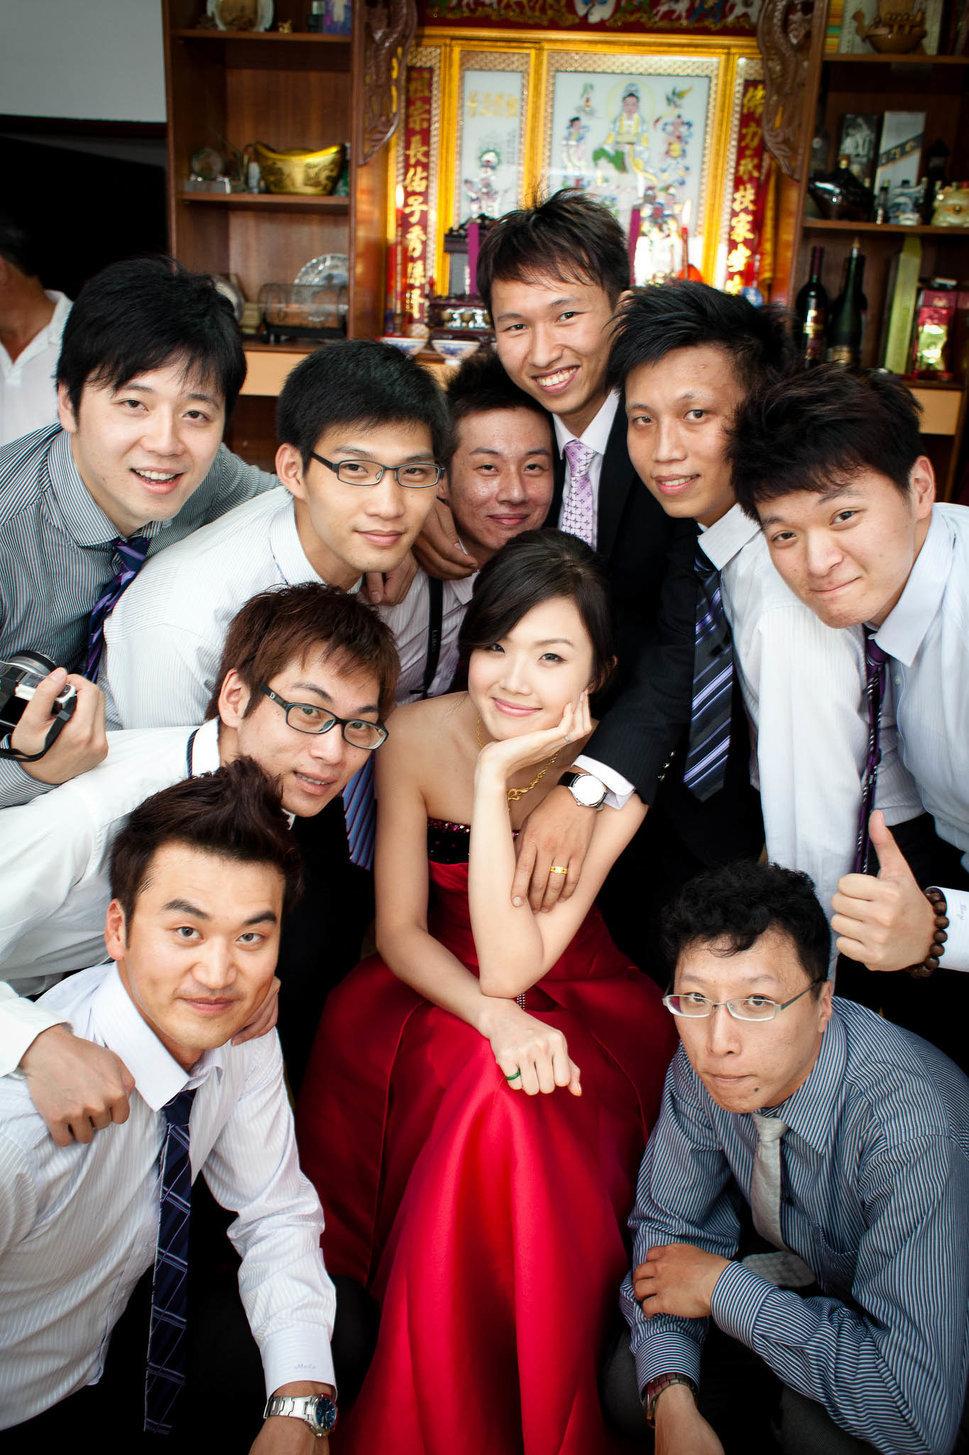 18PHOTO-敔帆❤️ 卿瑜(編號:242275) - 18PHOTO 婚紗影像攝影工作室 - 結婚吧一站式婚禮服務平台